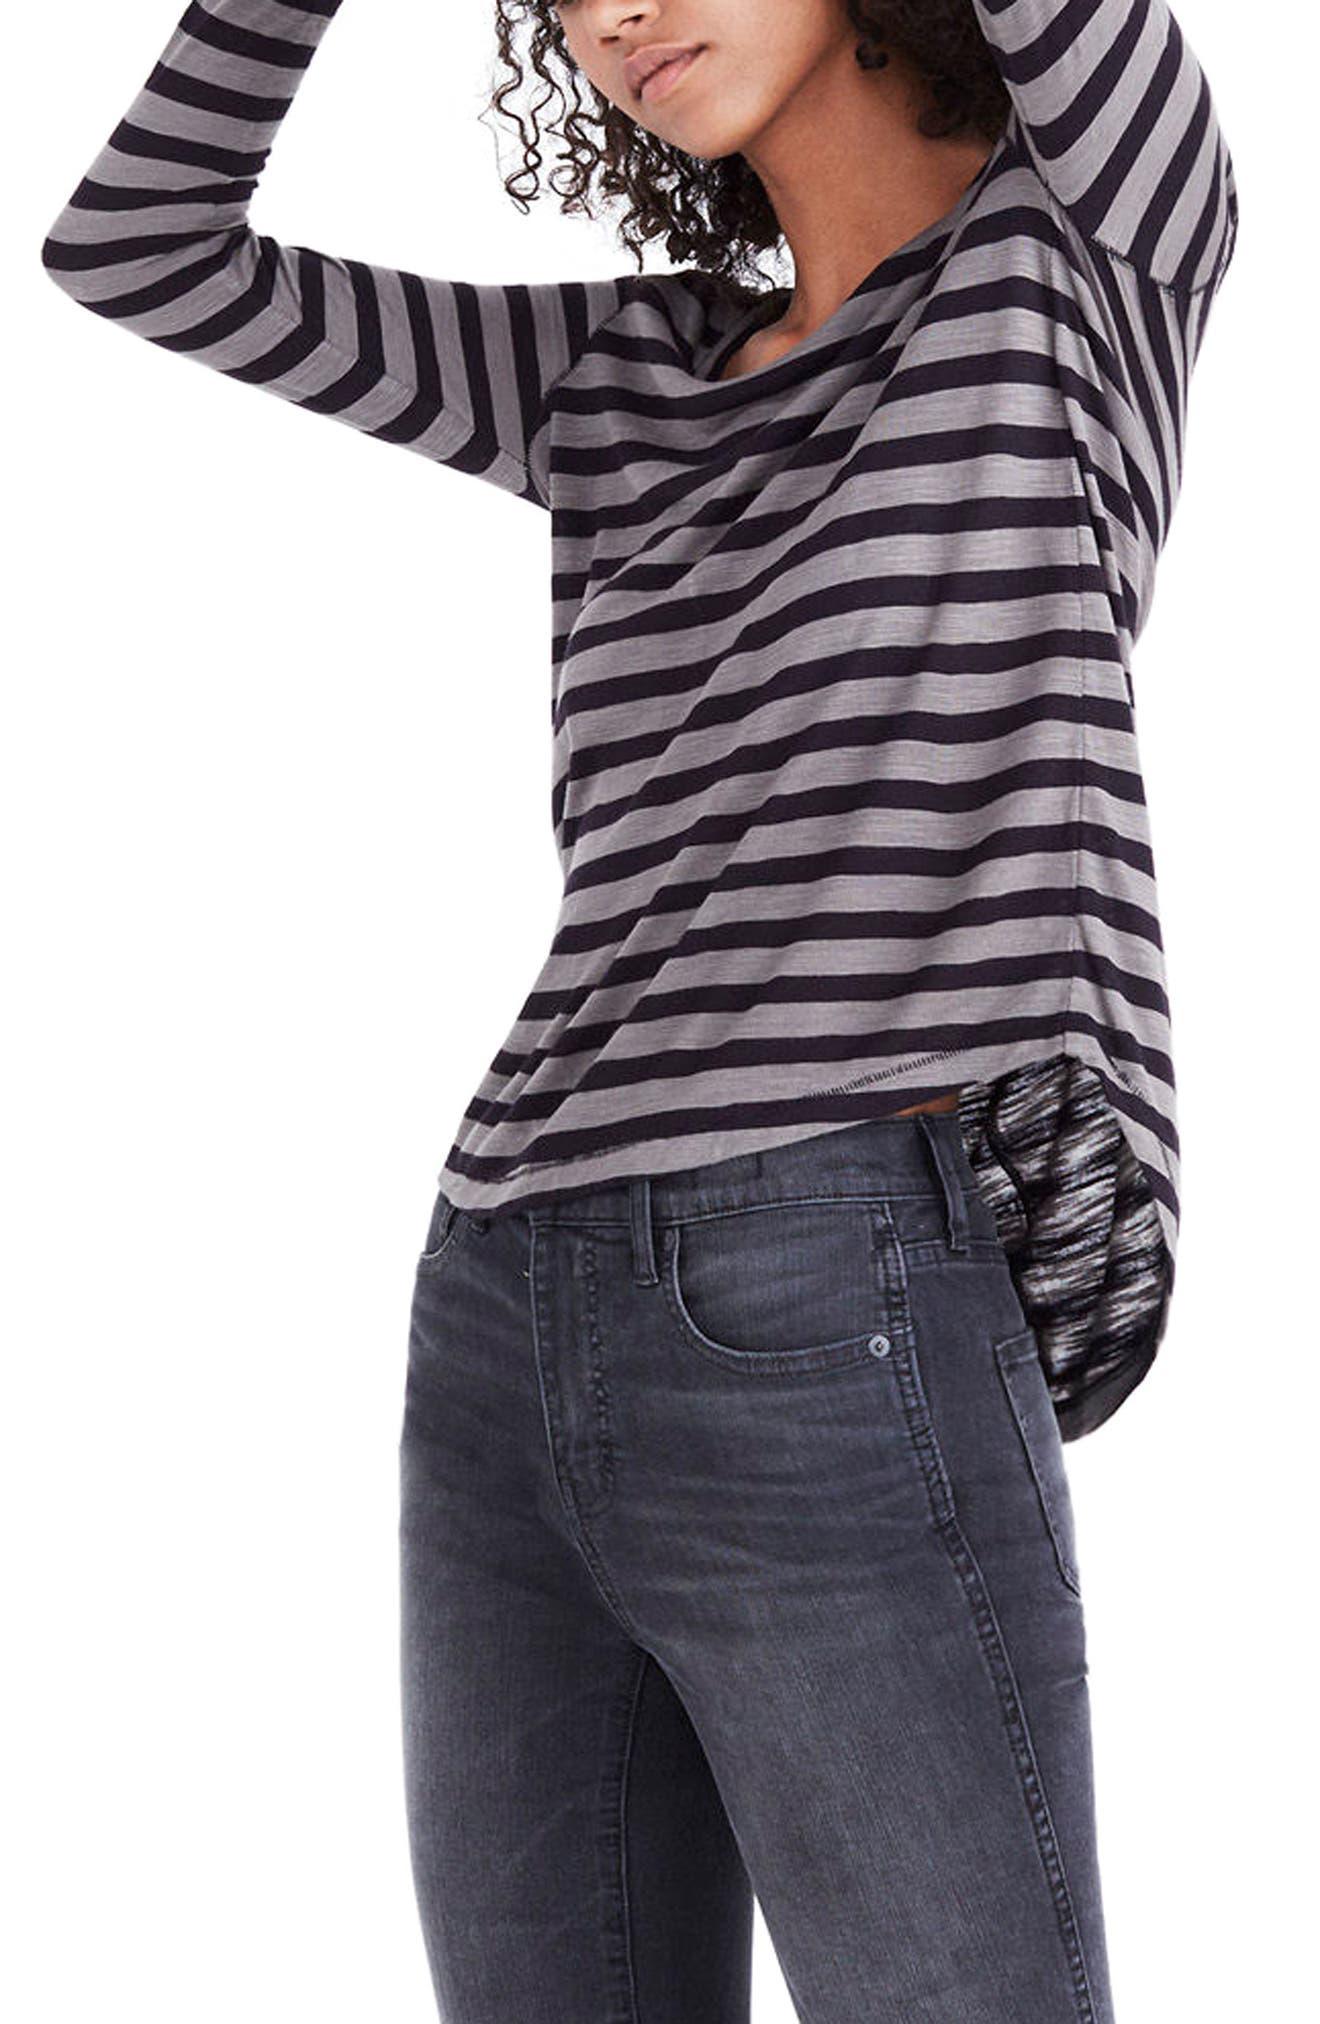 Alternate Image 1 Selected - Madewell Anthem Stripe Long Sleeve Tee